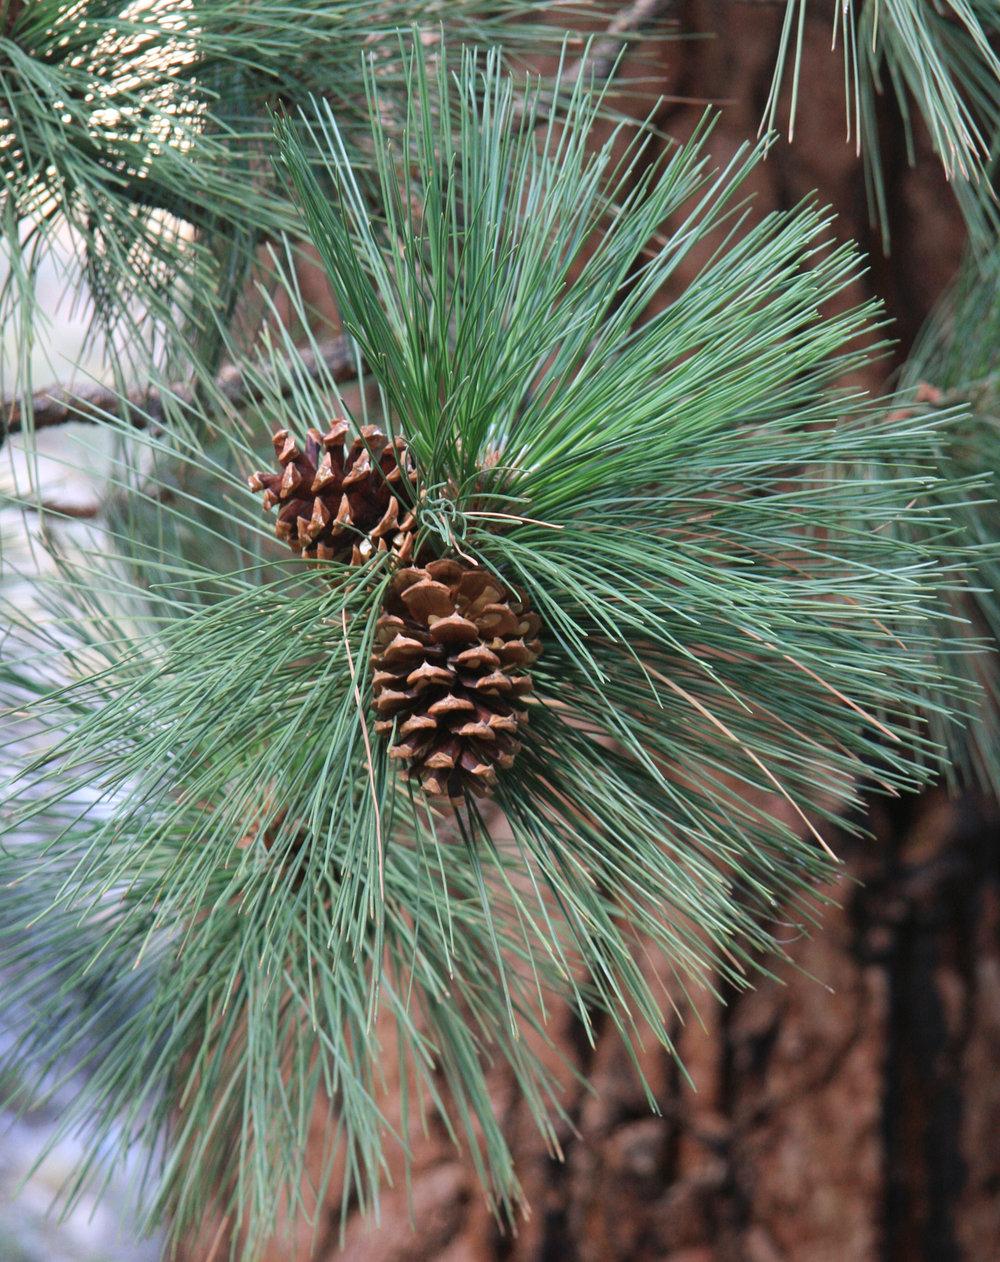 Ponderosa_Pine_Pinus_ponderosa_needles_cones.jpg